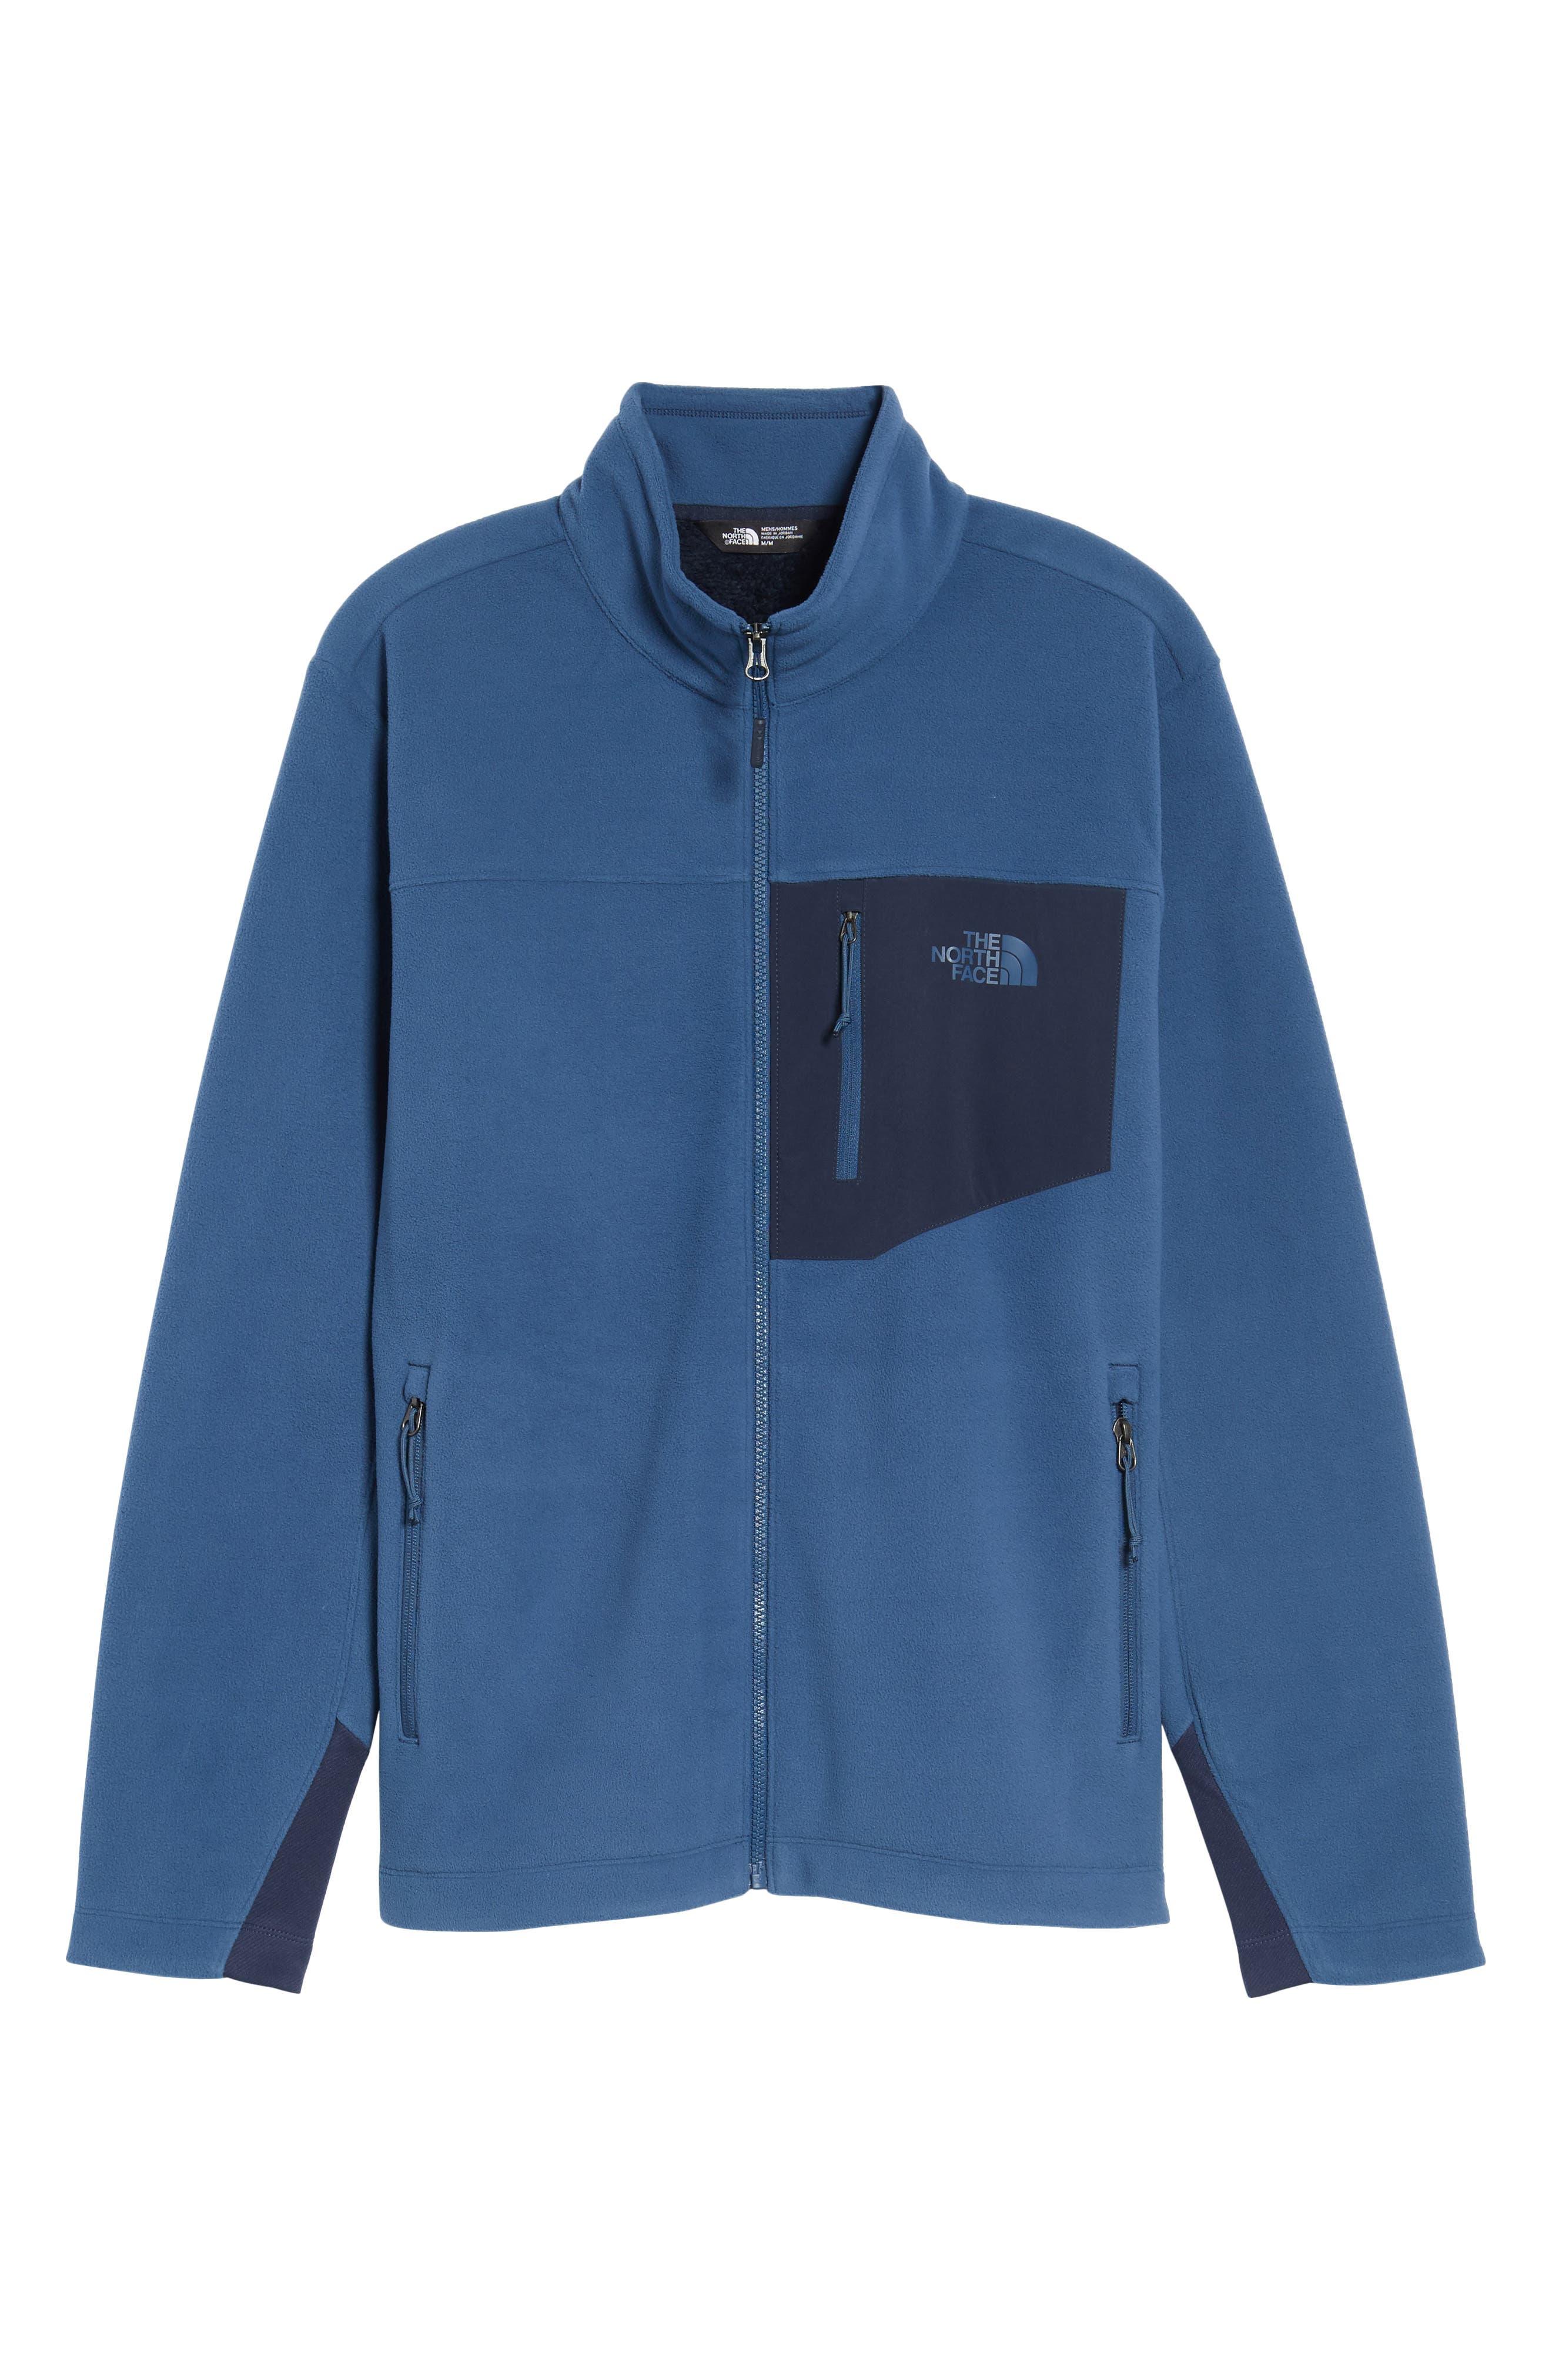 'Chimborazo' Zip Front Fleece Jacket,                             Alternate thumbnail 42, color,